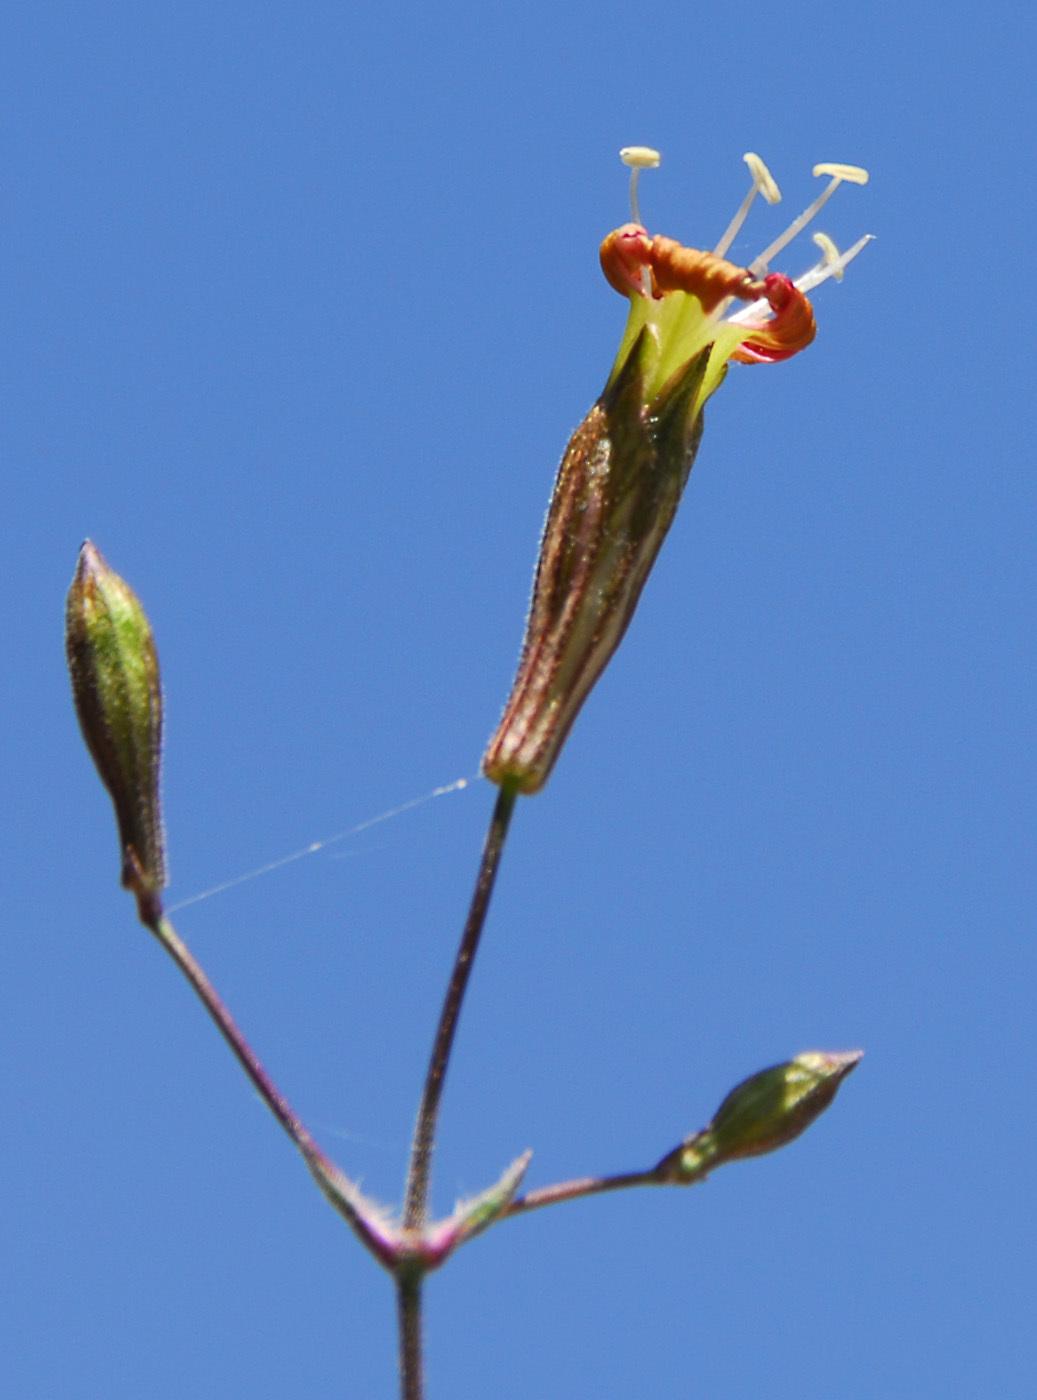 https://pictures.bgbm.org/digilib/Scaler?fn=Cyprus/Silene_galataea_B1.jpg&mo=file